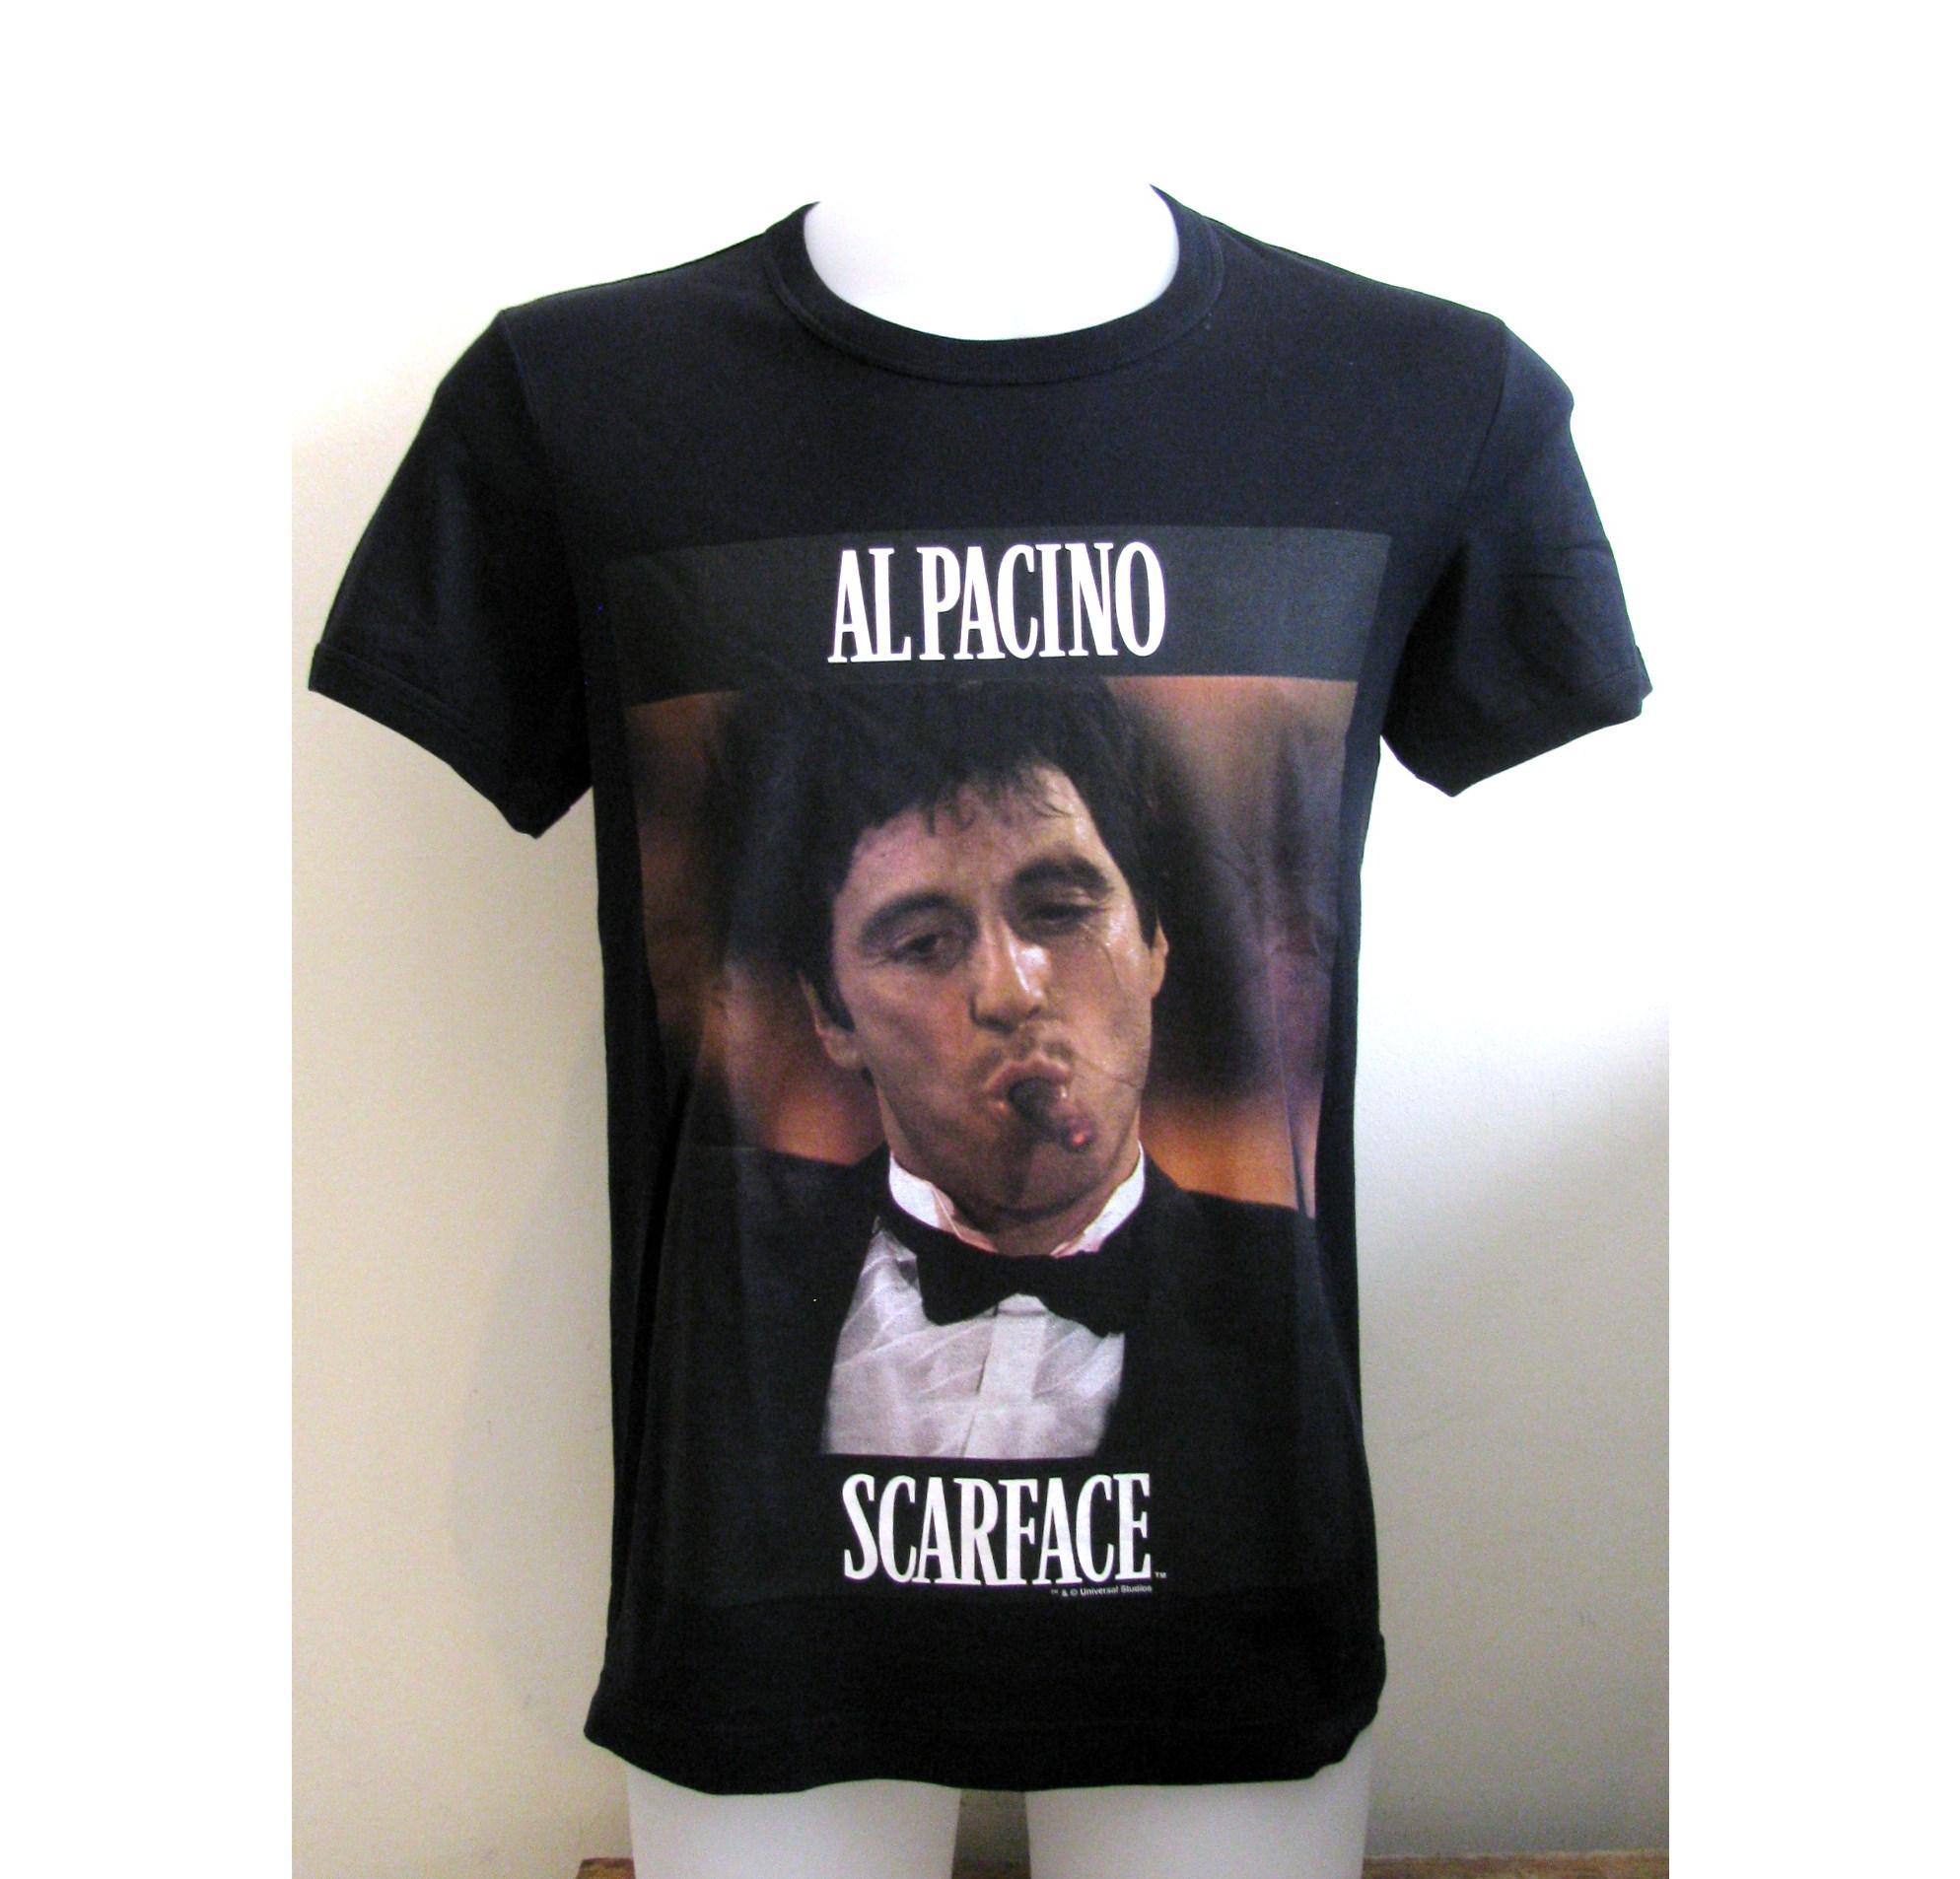 9f9daf009 Dolcegabbana Scarface Tshirt | HEWI London